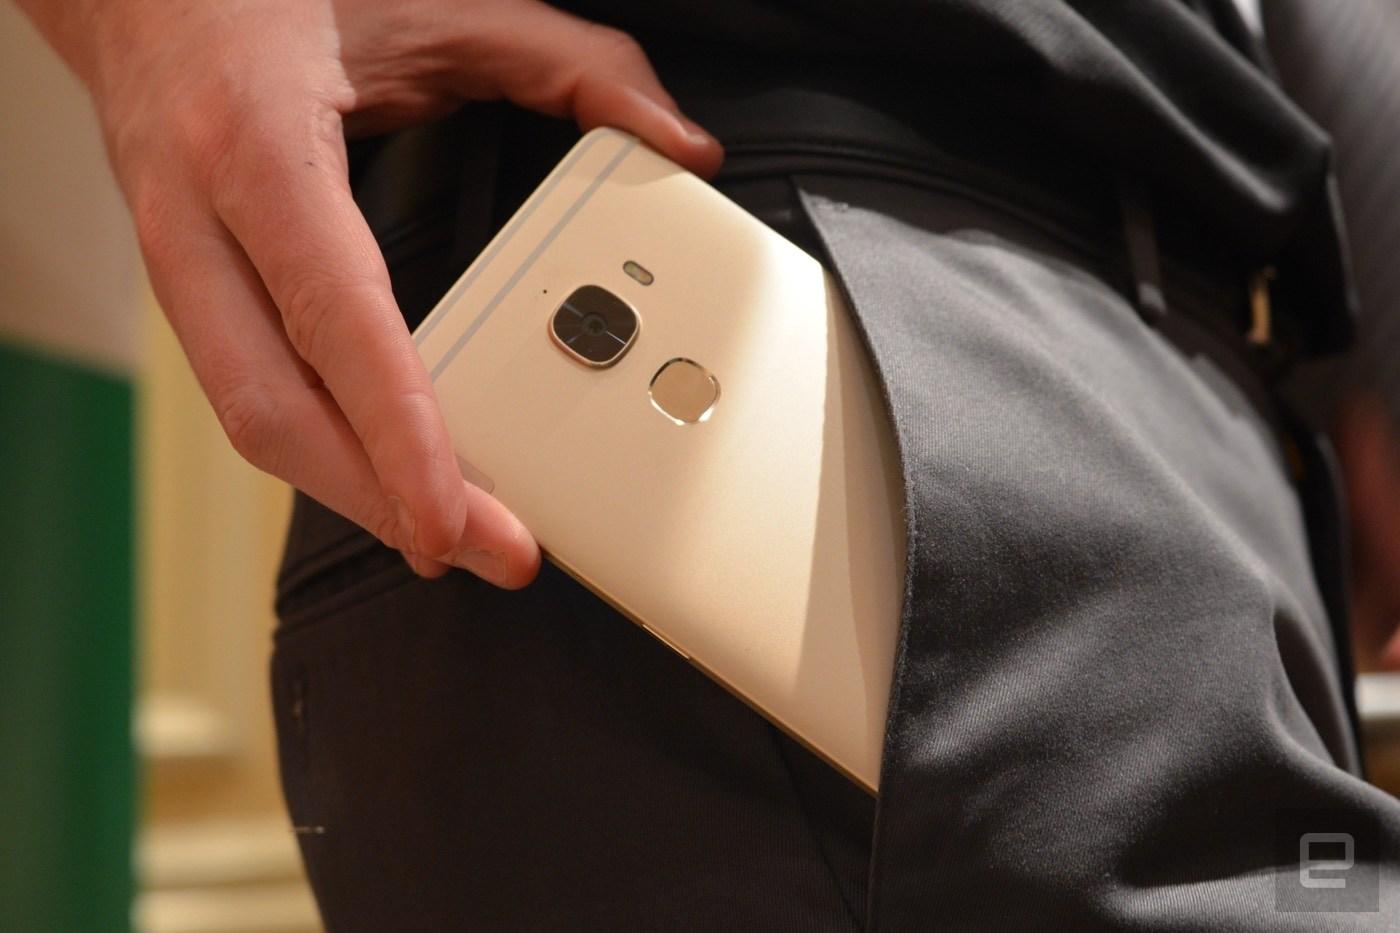 primer teléfono del mundo con un chipset Snapdragon 820